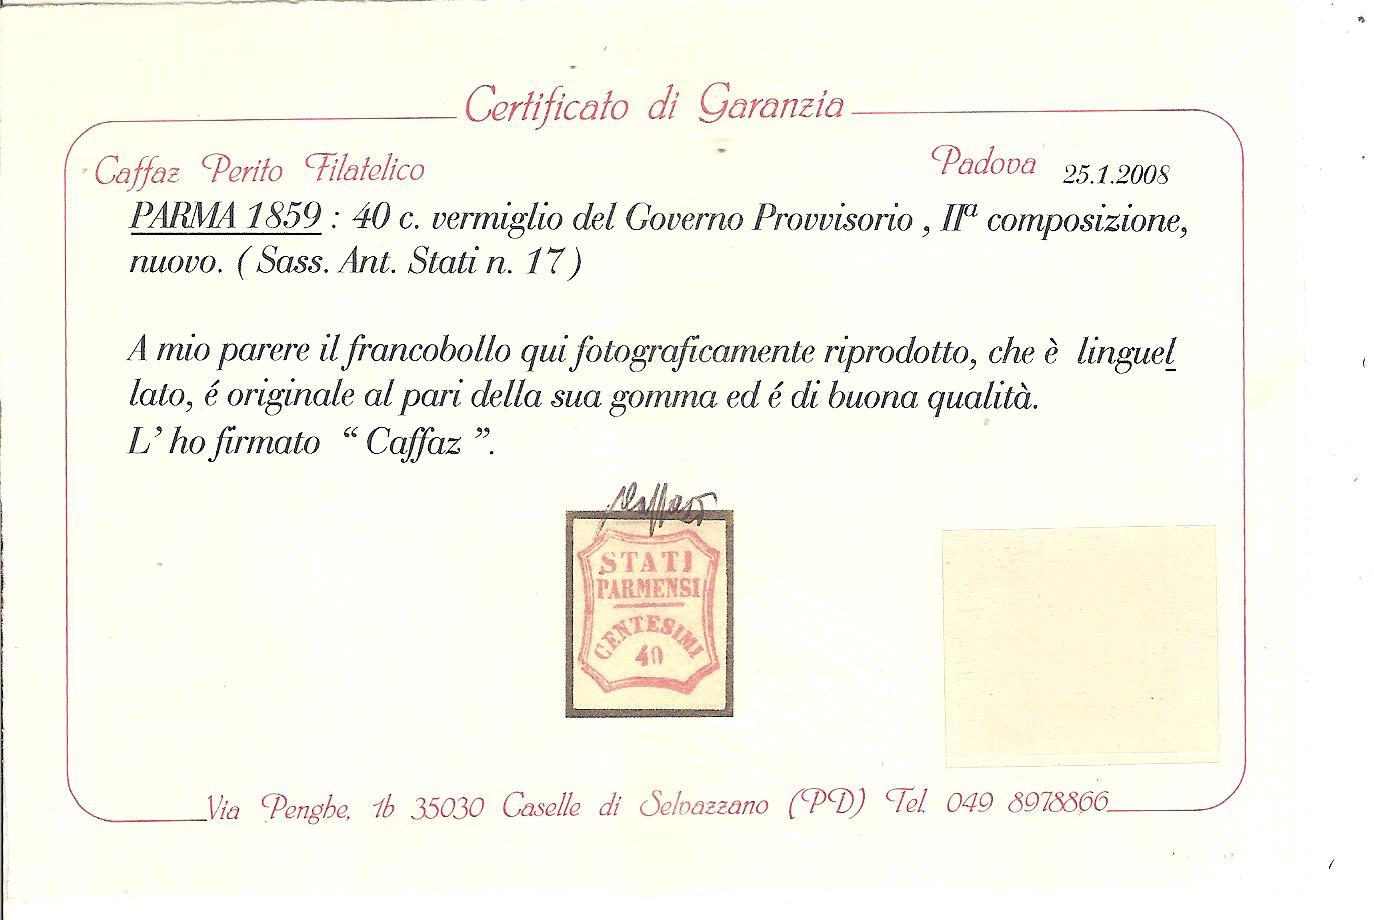 Cert. Parma n.17 001